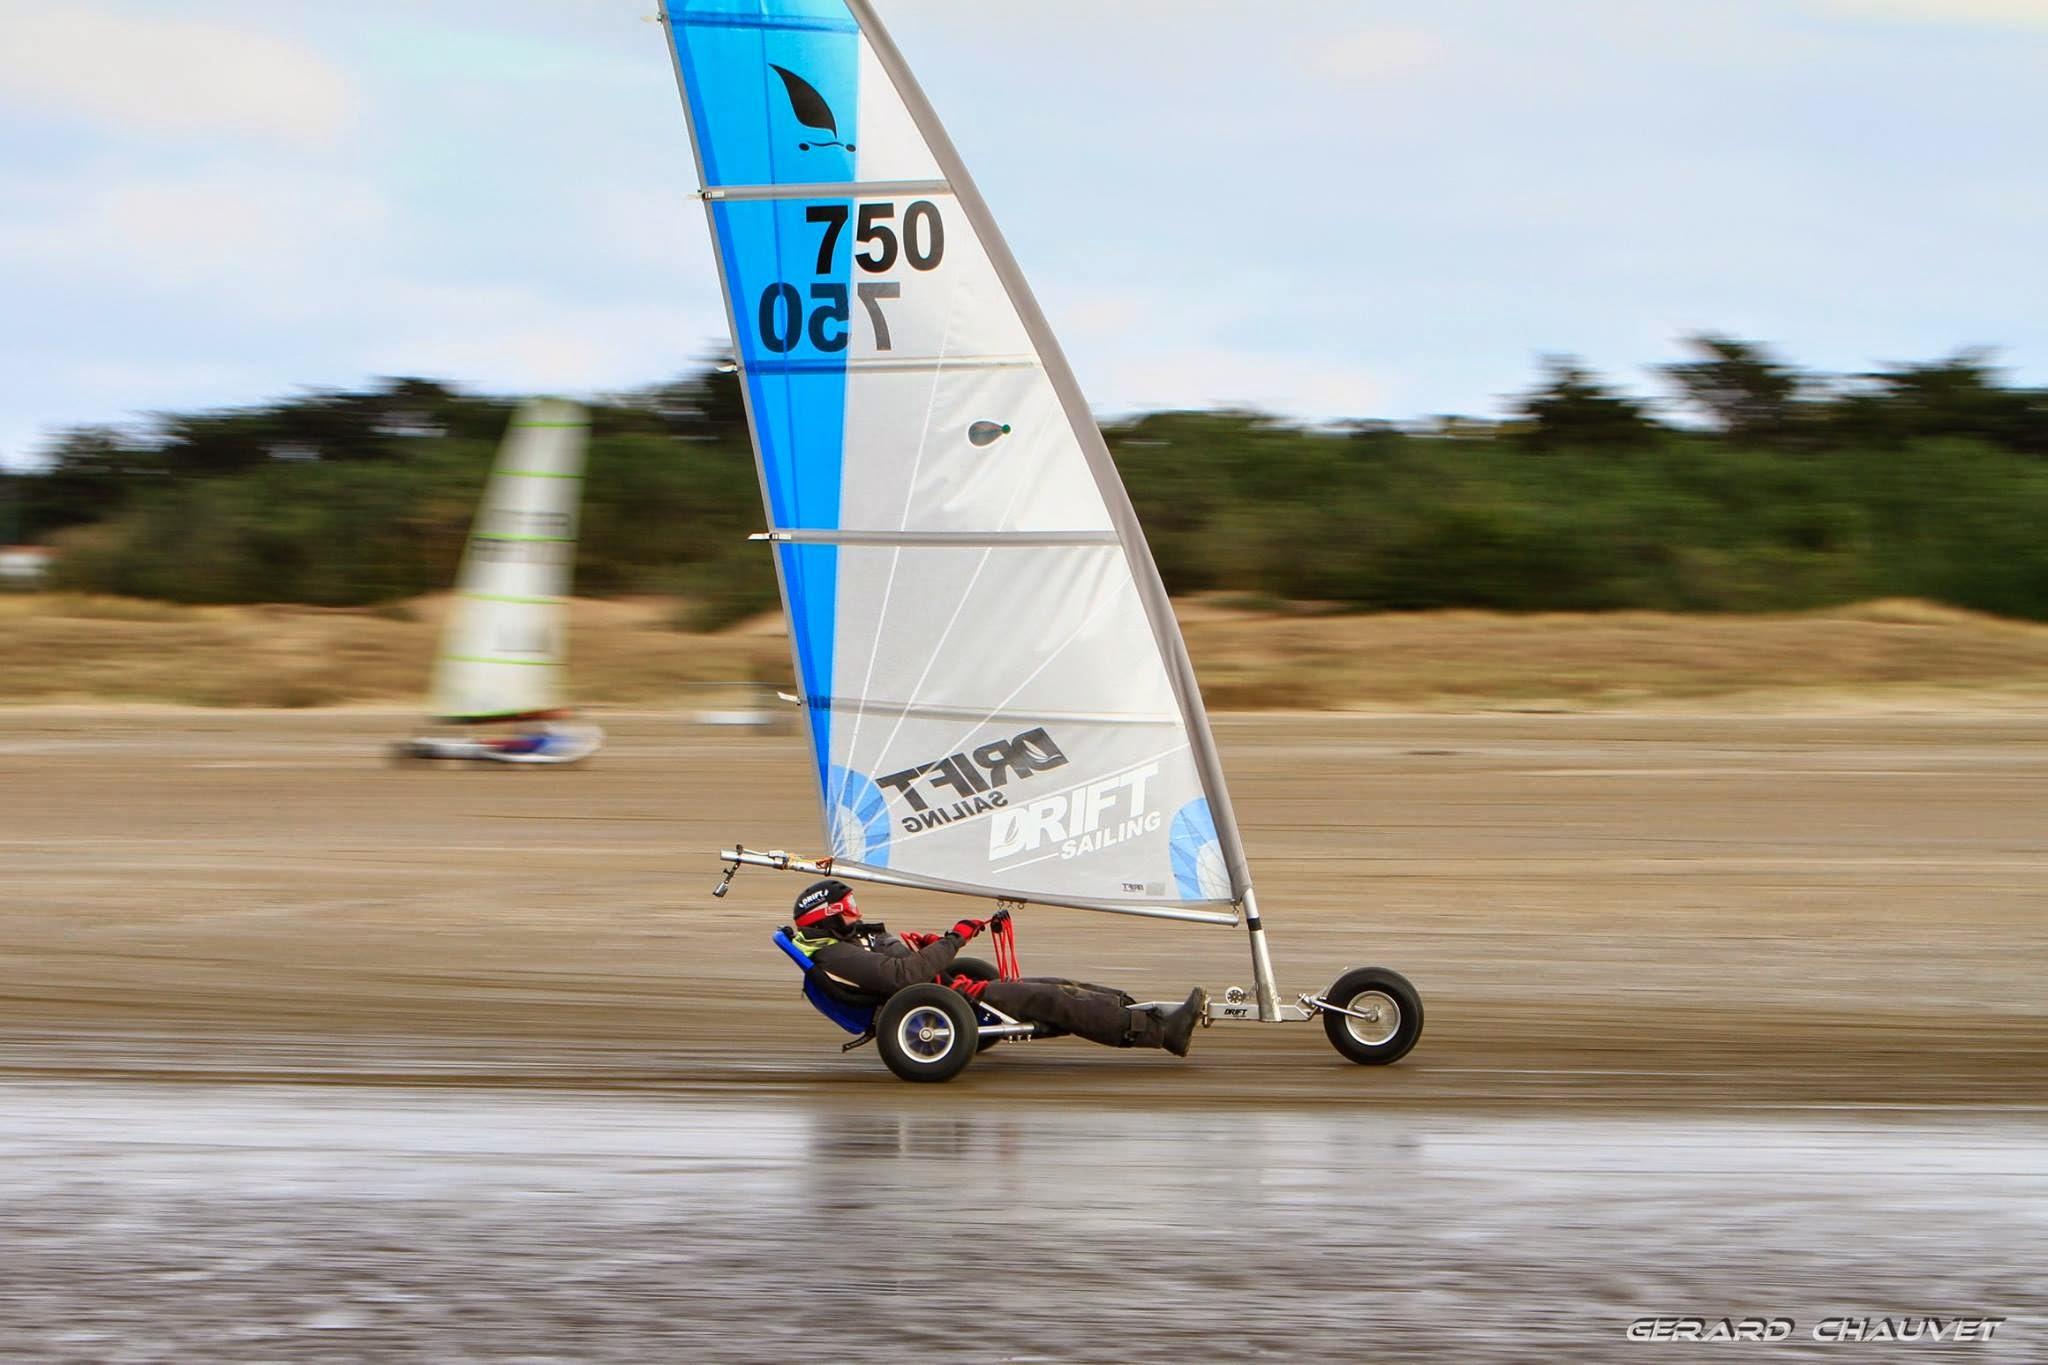 Grand Prix Char A Voile Pleneuf Val Andre 2017 Drift Sailing Char A Voile Loisir Et Competitiondrift Sailing Char A Voile Loisir Et Competition